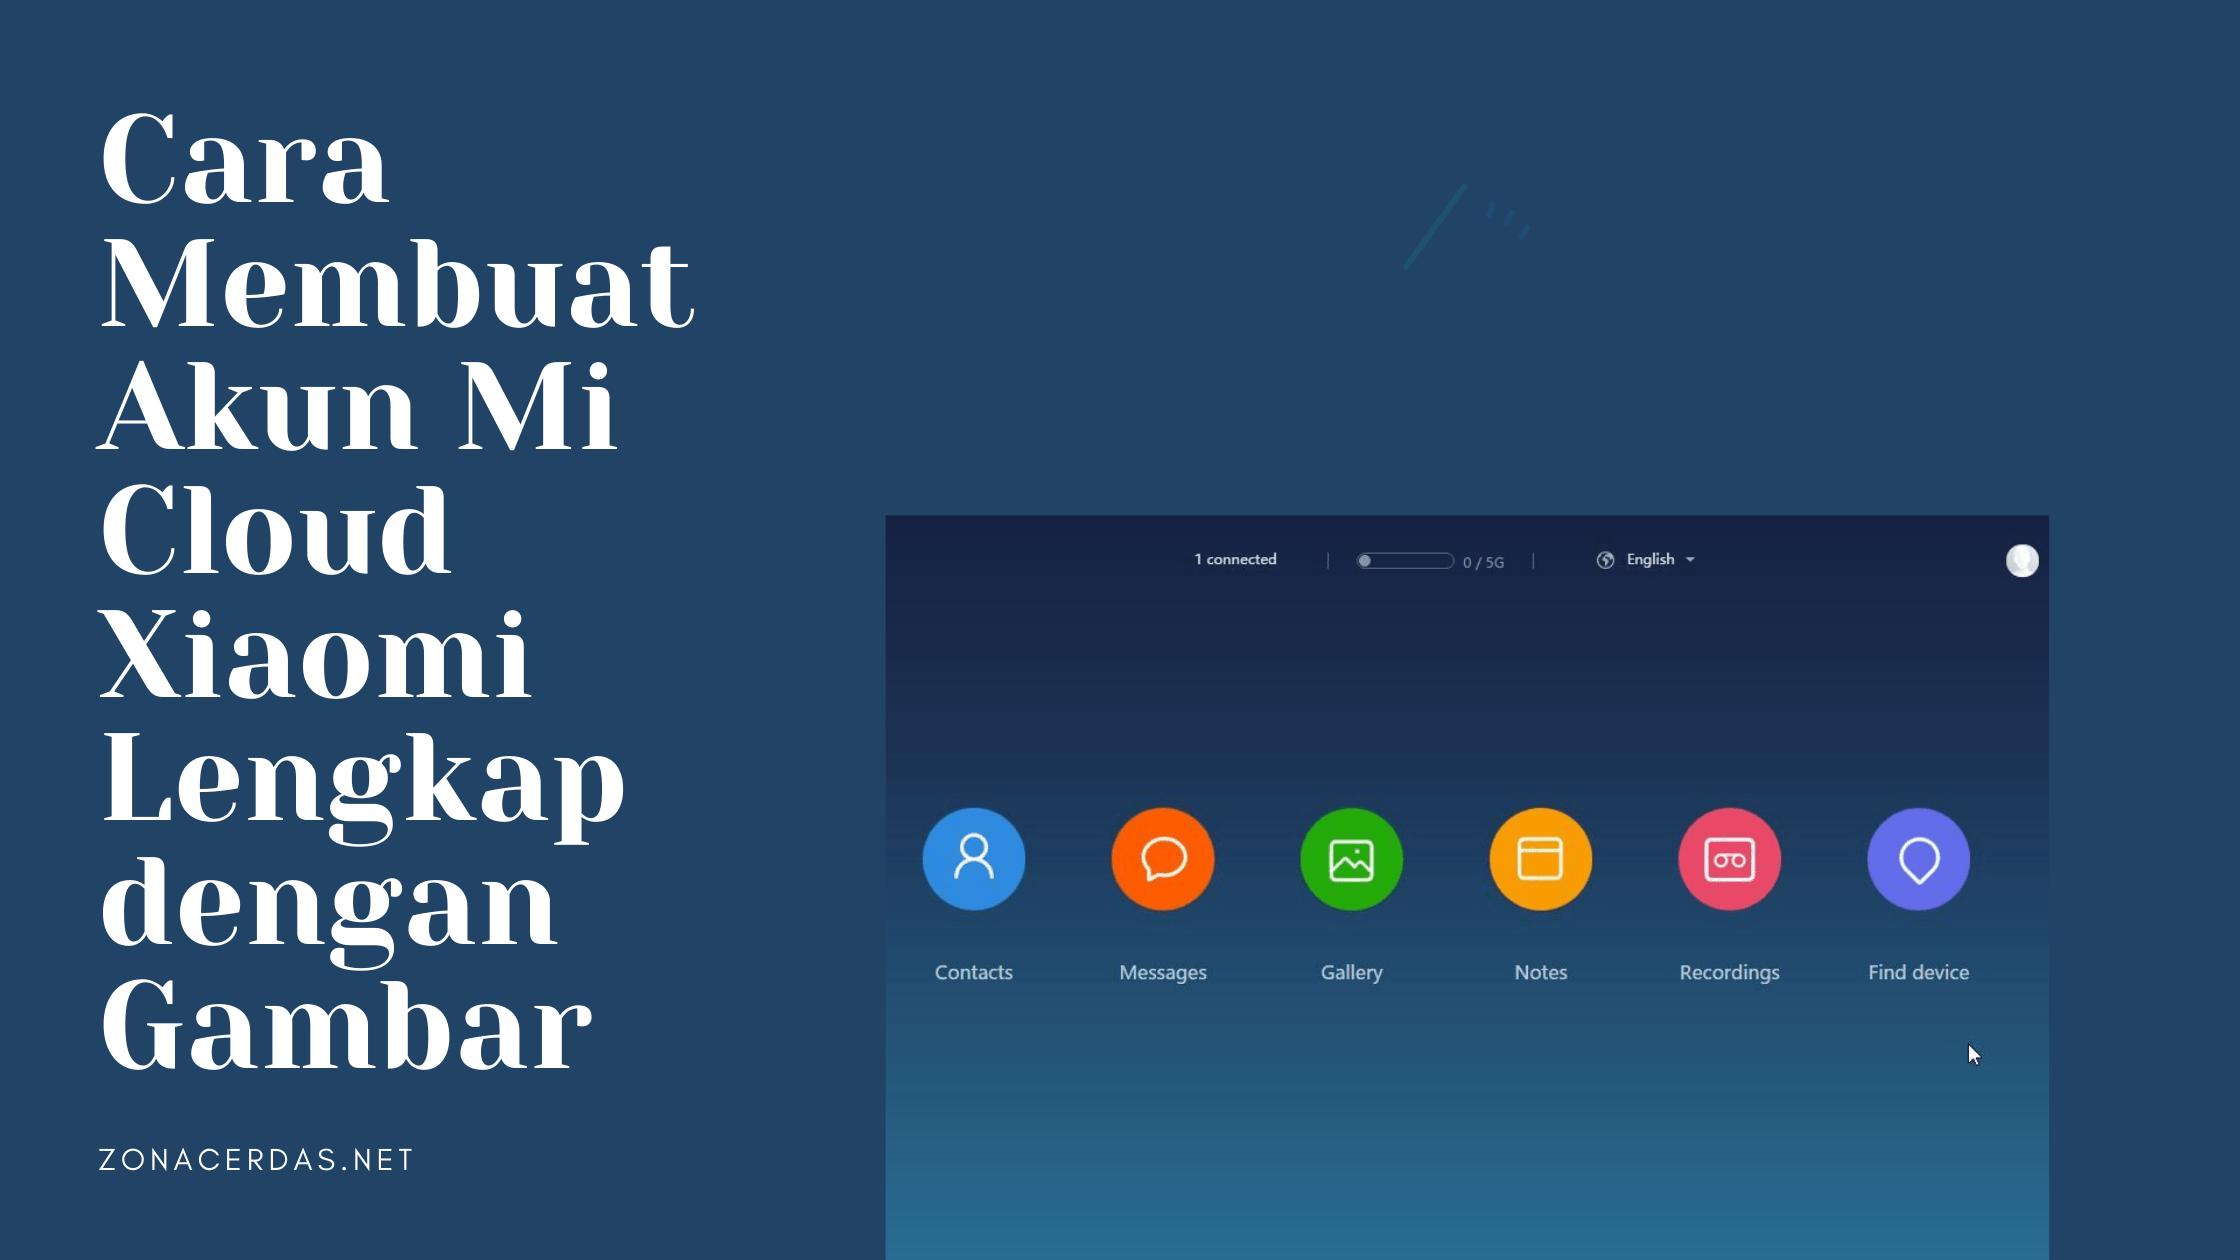 Cara Membuat Akun Mi Cloud Xiaomi Lengkap dengan Gambar